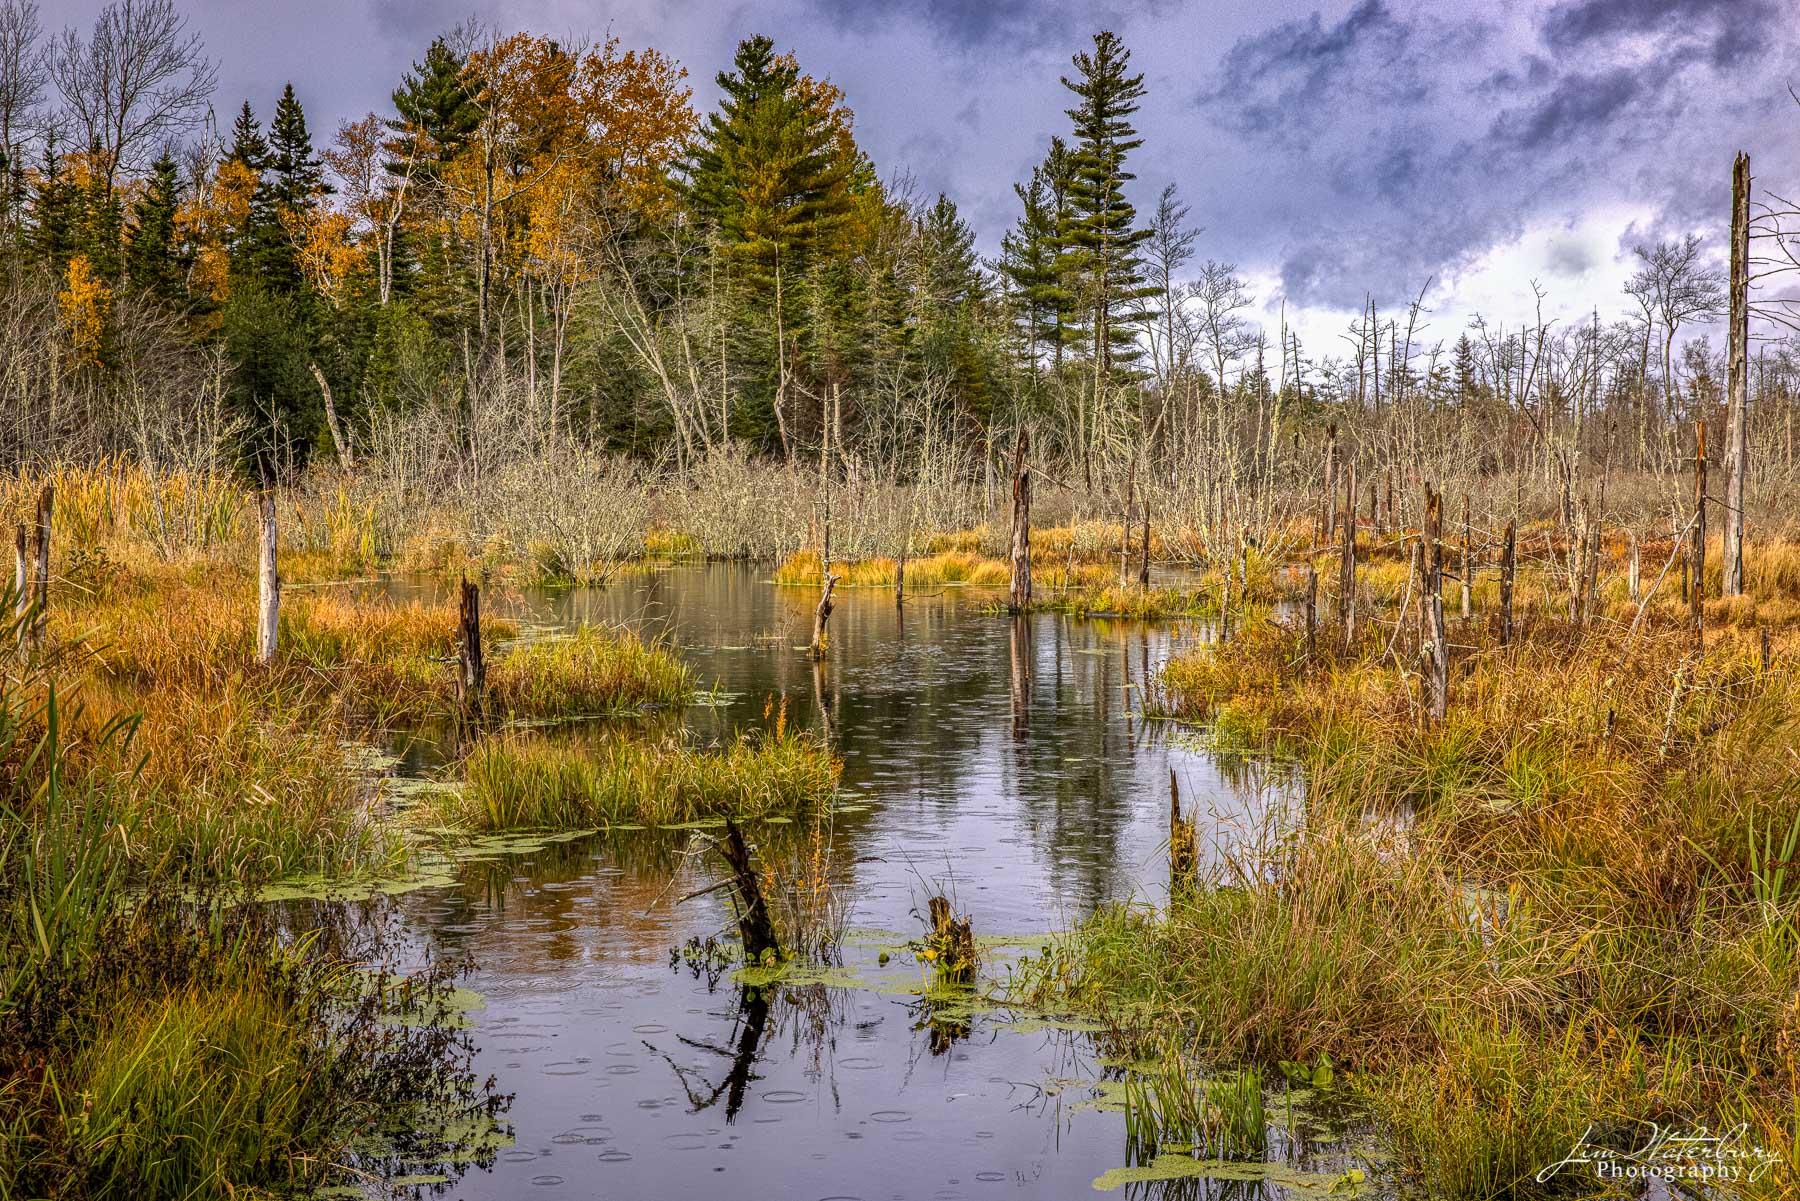 Raindrops falling in a marsh near Cushing, Maine